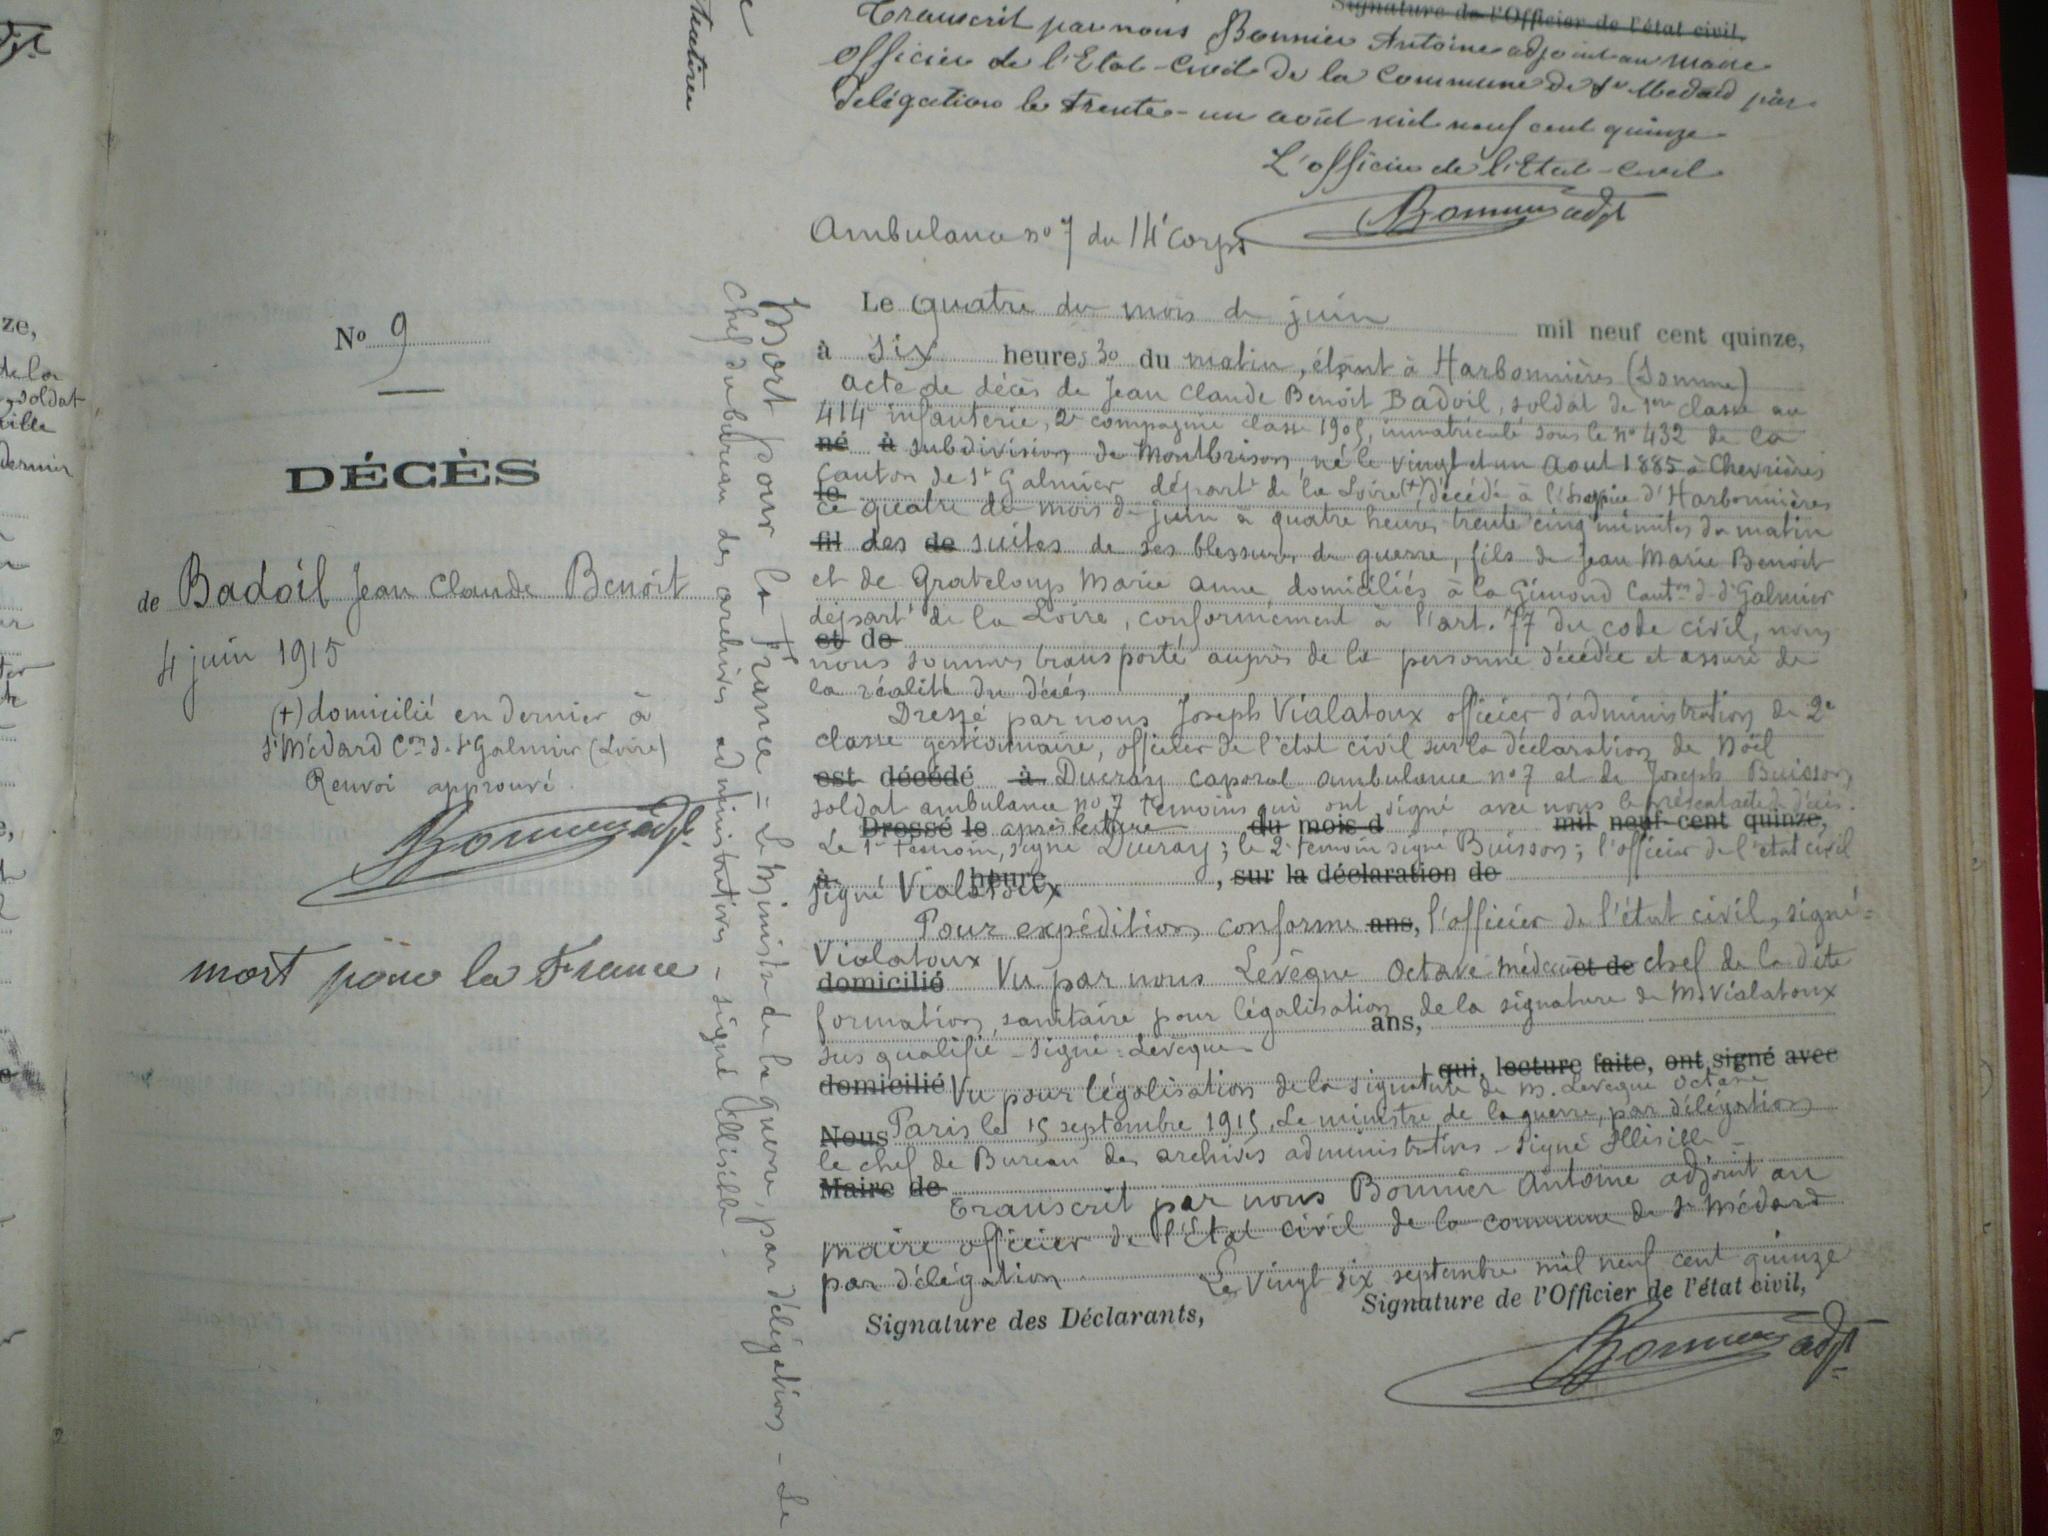 Jean-Claude-Benoit-Badoil-11-06-1915.JPG